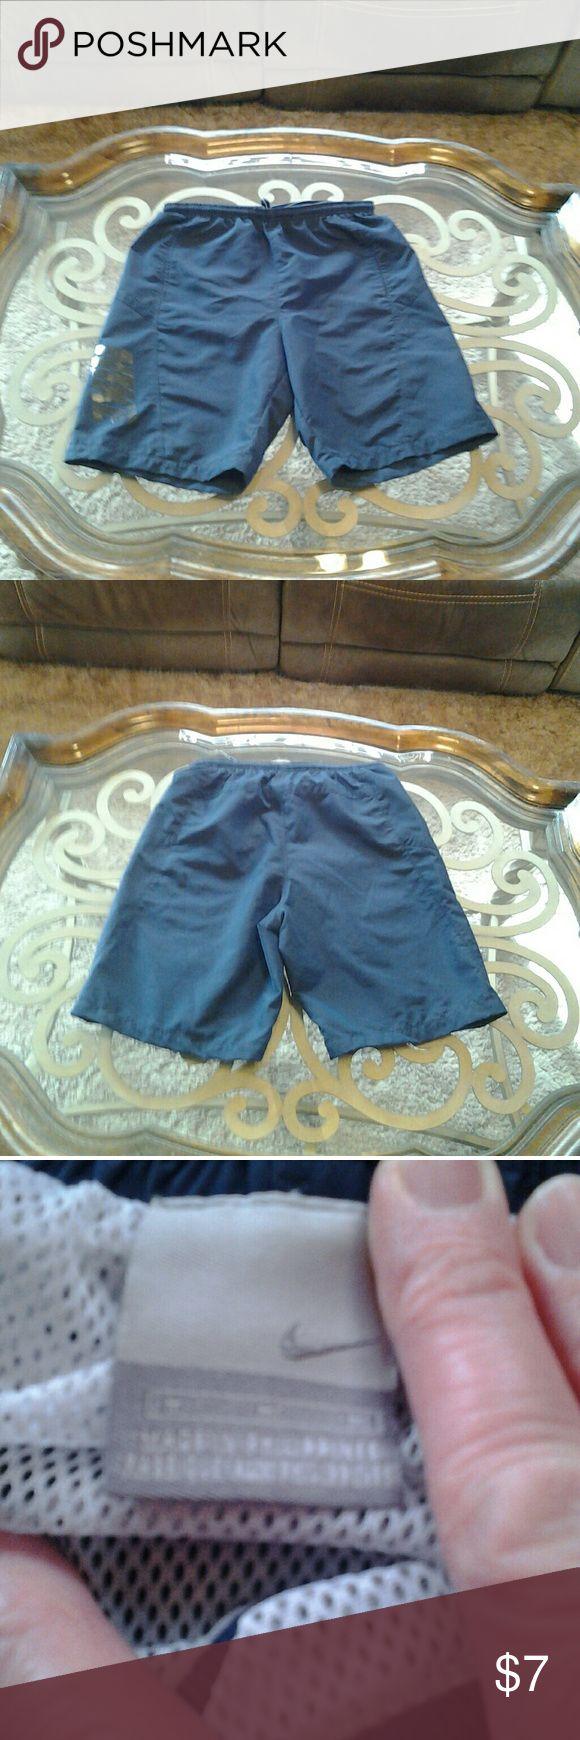 Nike mens shorts size med Nike mens shorts size med Nike  Shorts